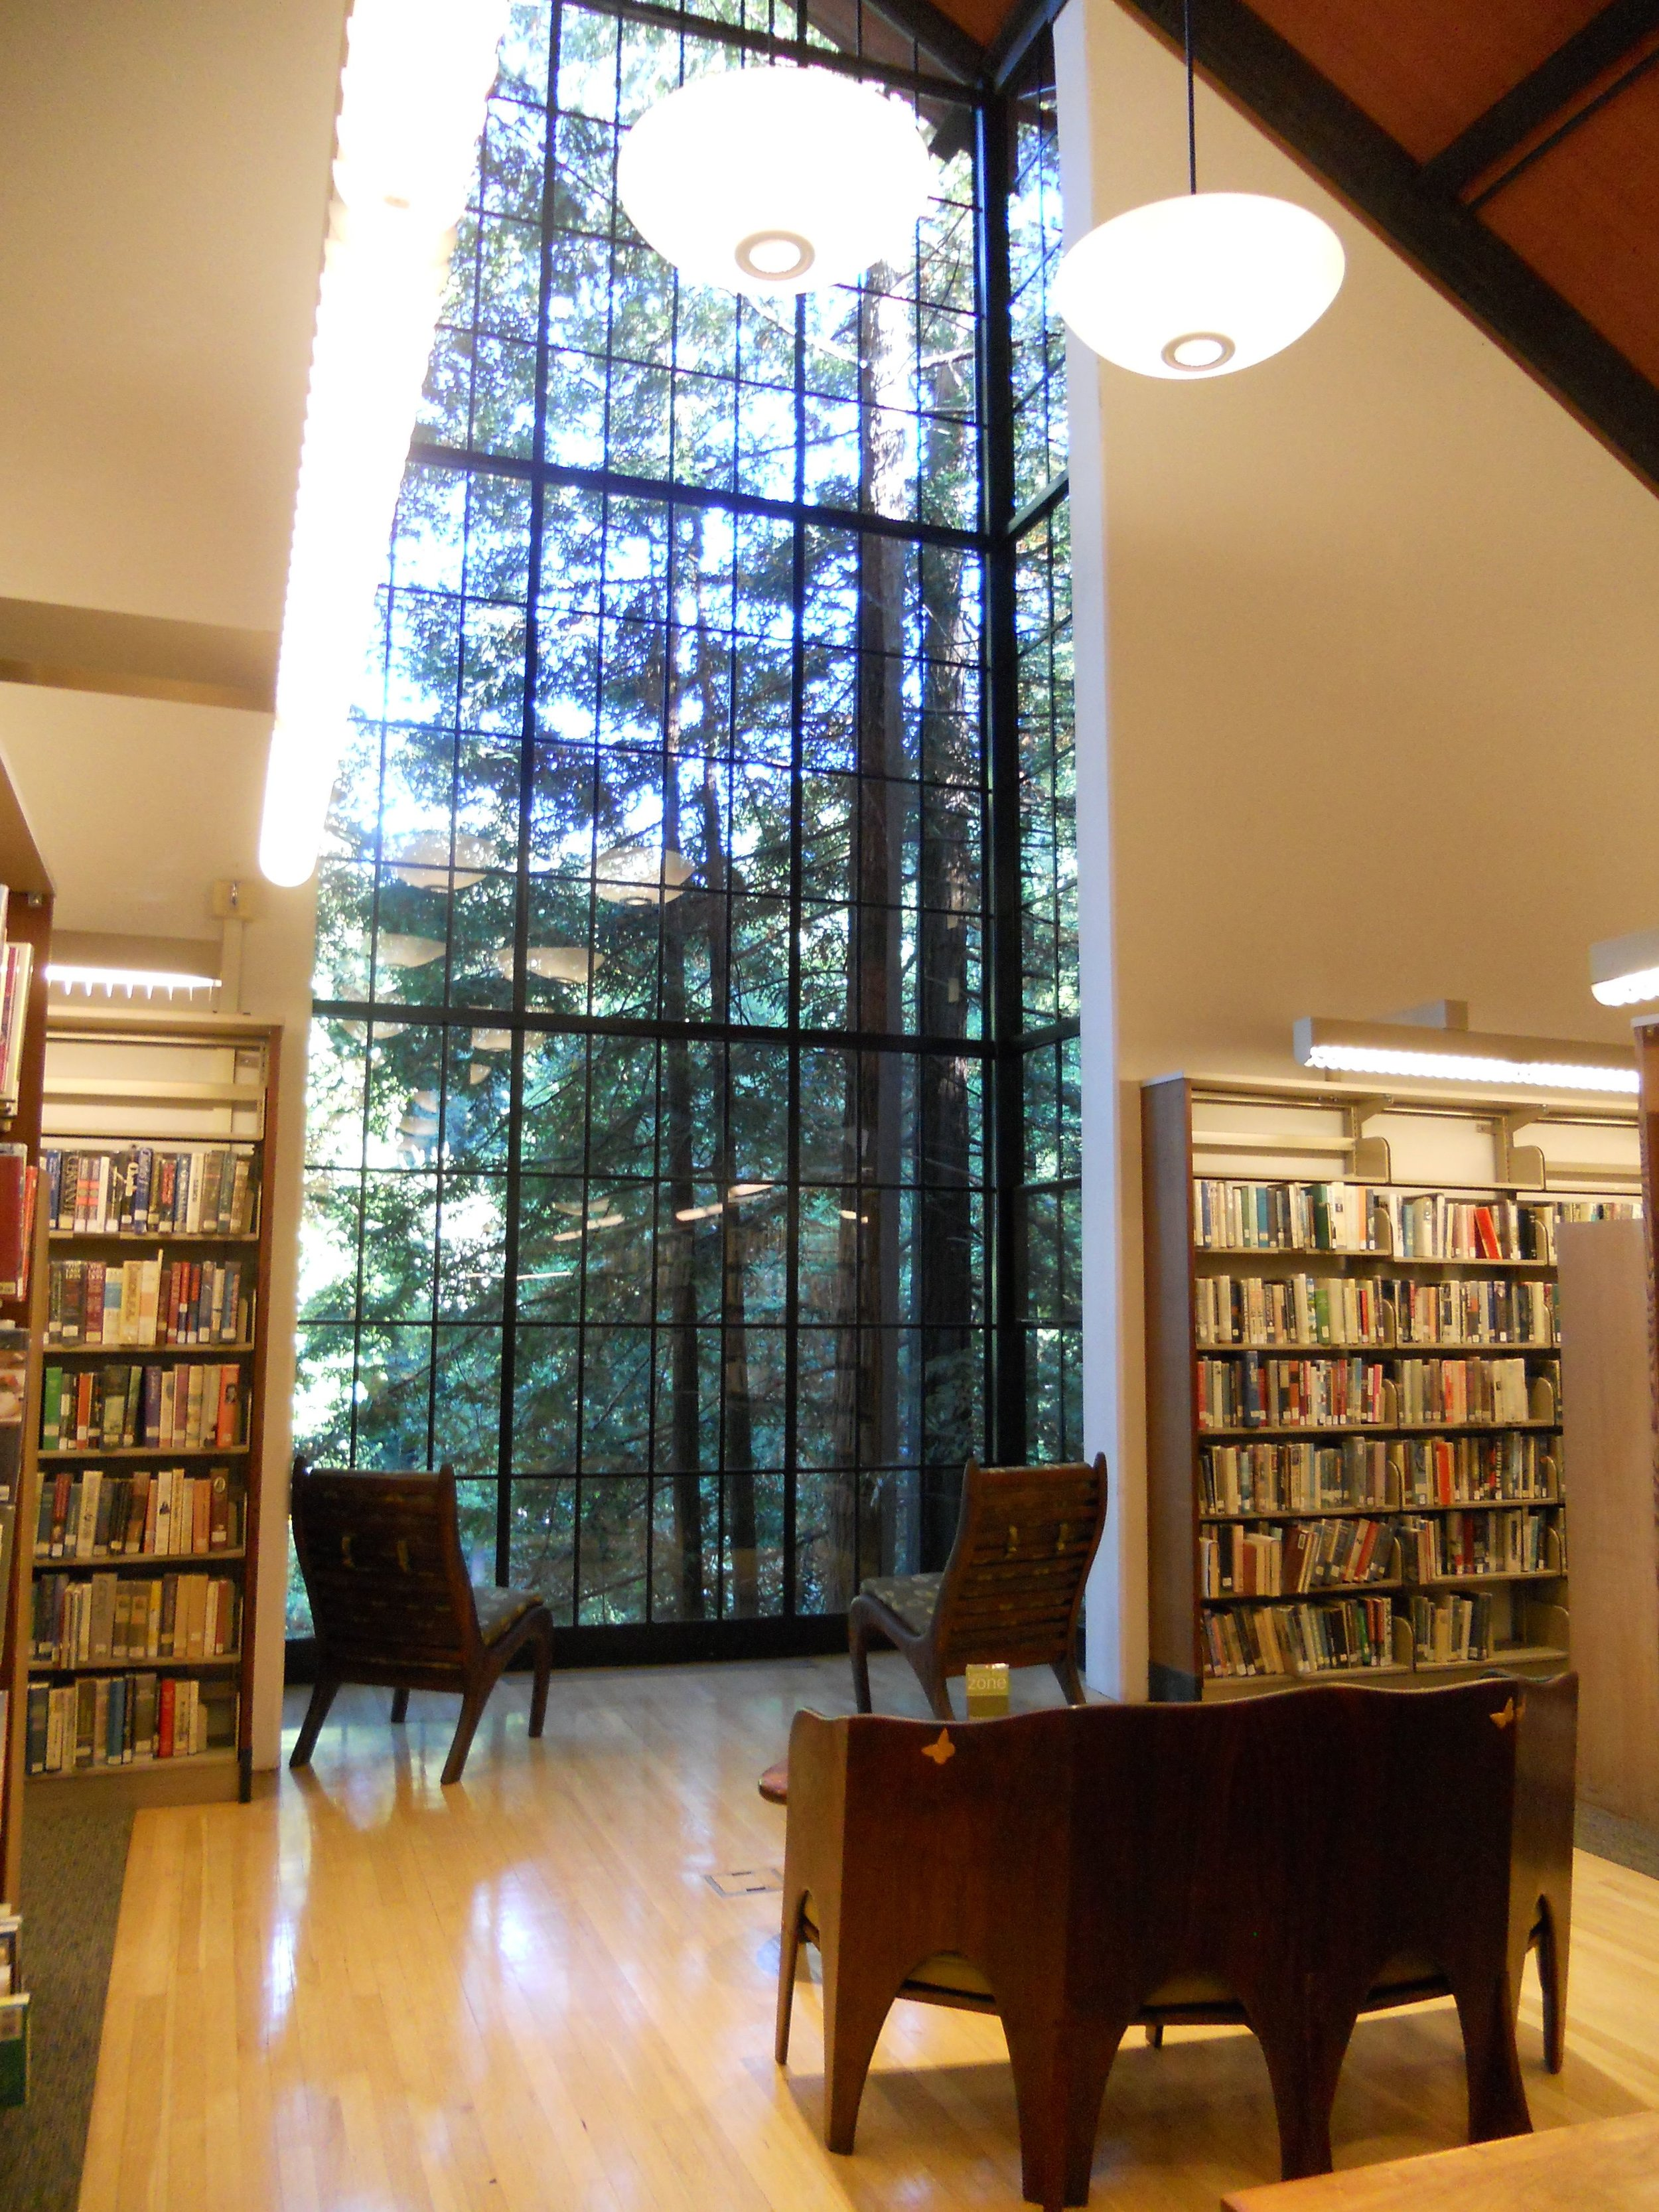 Mill Valley Public Library, Mill Valley, CA